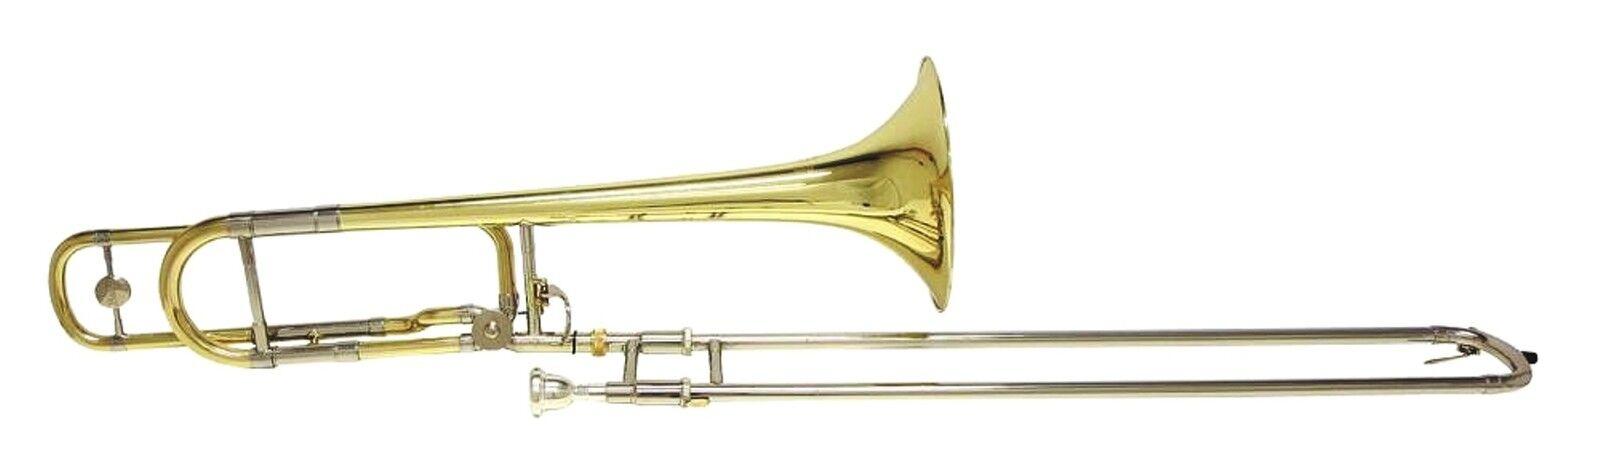 POSAUNE Bach TB-503 B PRELUDE  Bb -F QUARTPOSAUNE + Koffer TROMBONE TB503 B